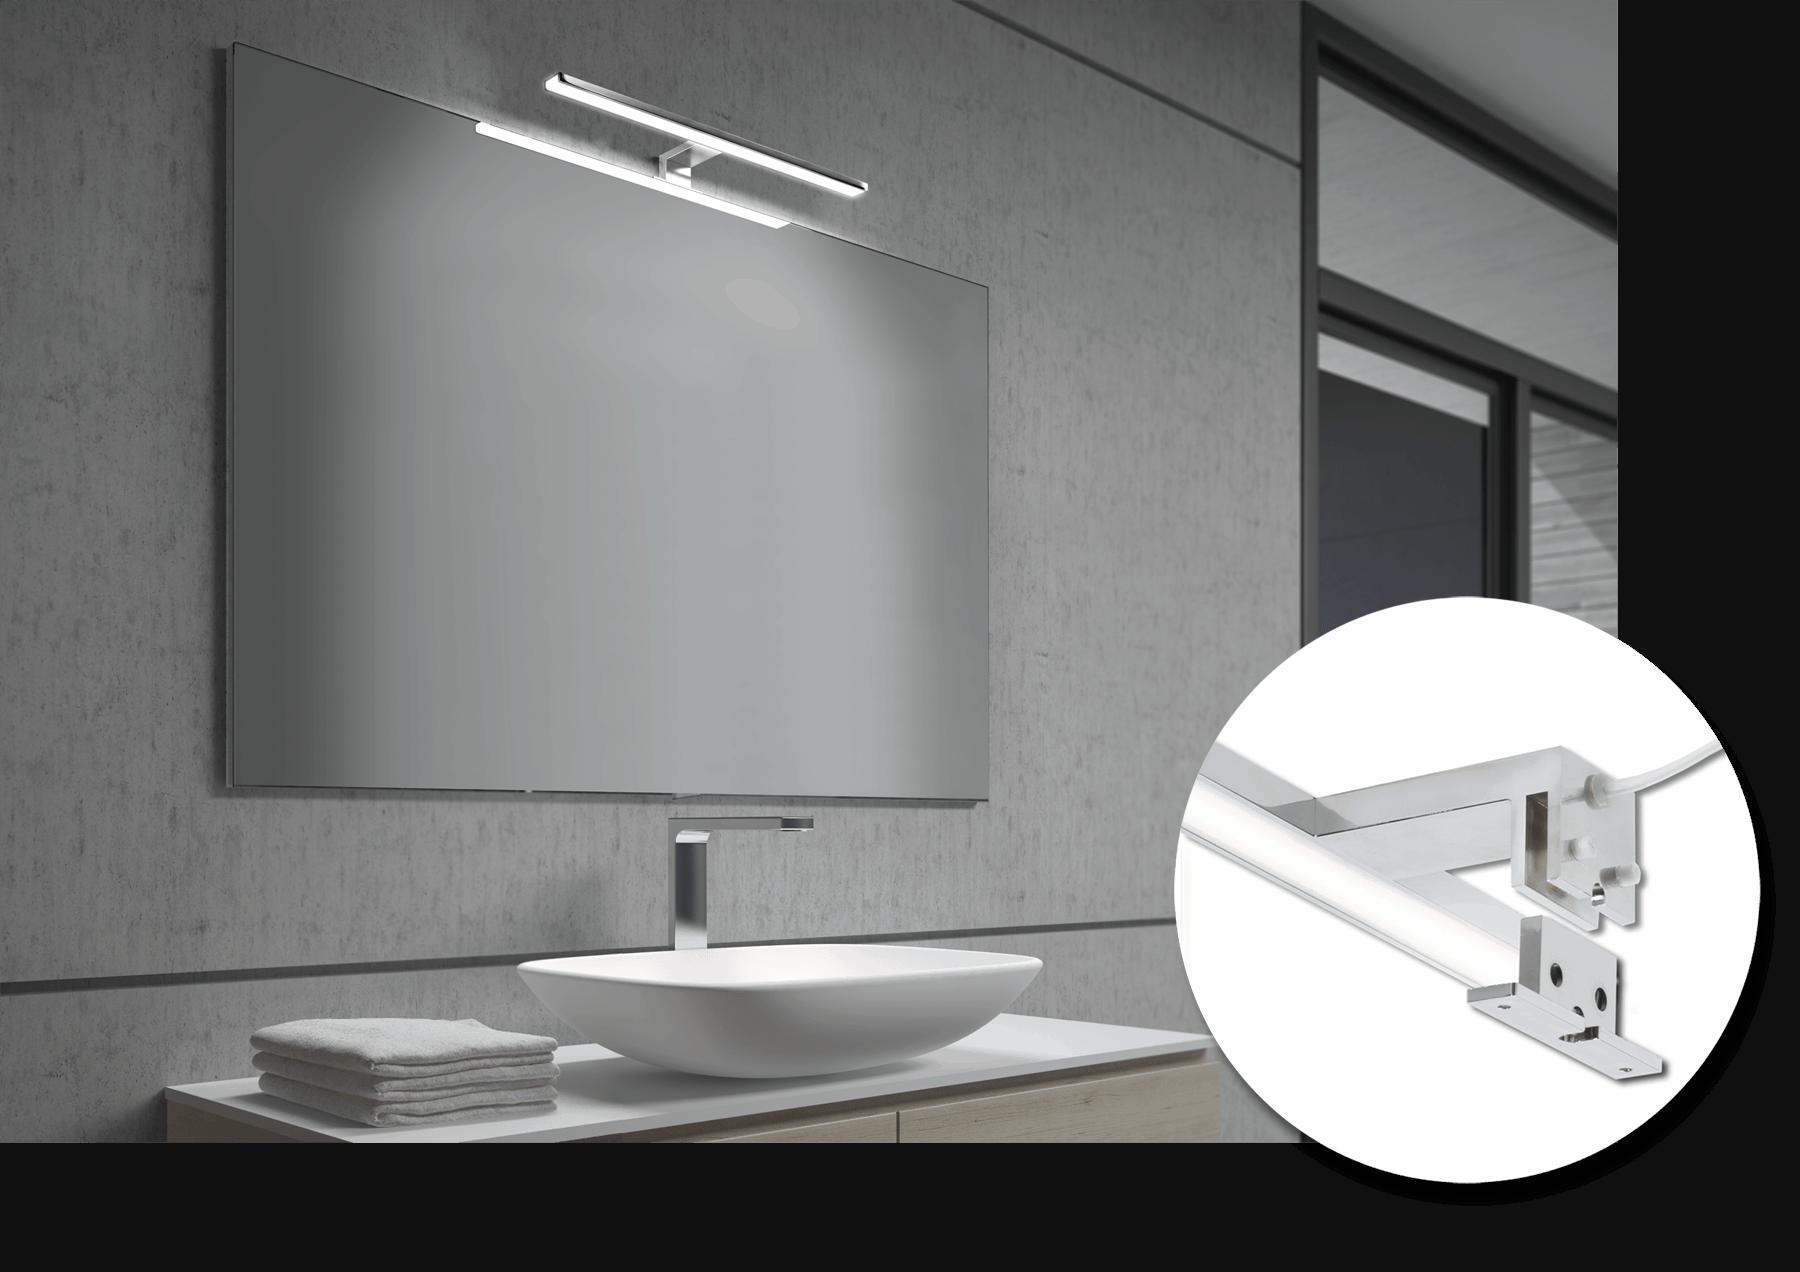 Badkamer Led Verlichting : Badkamer led verlichting archieven u matcall